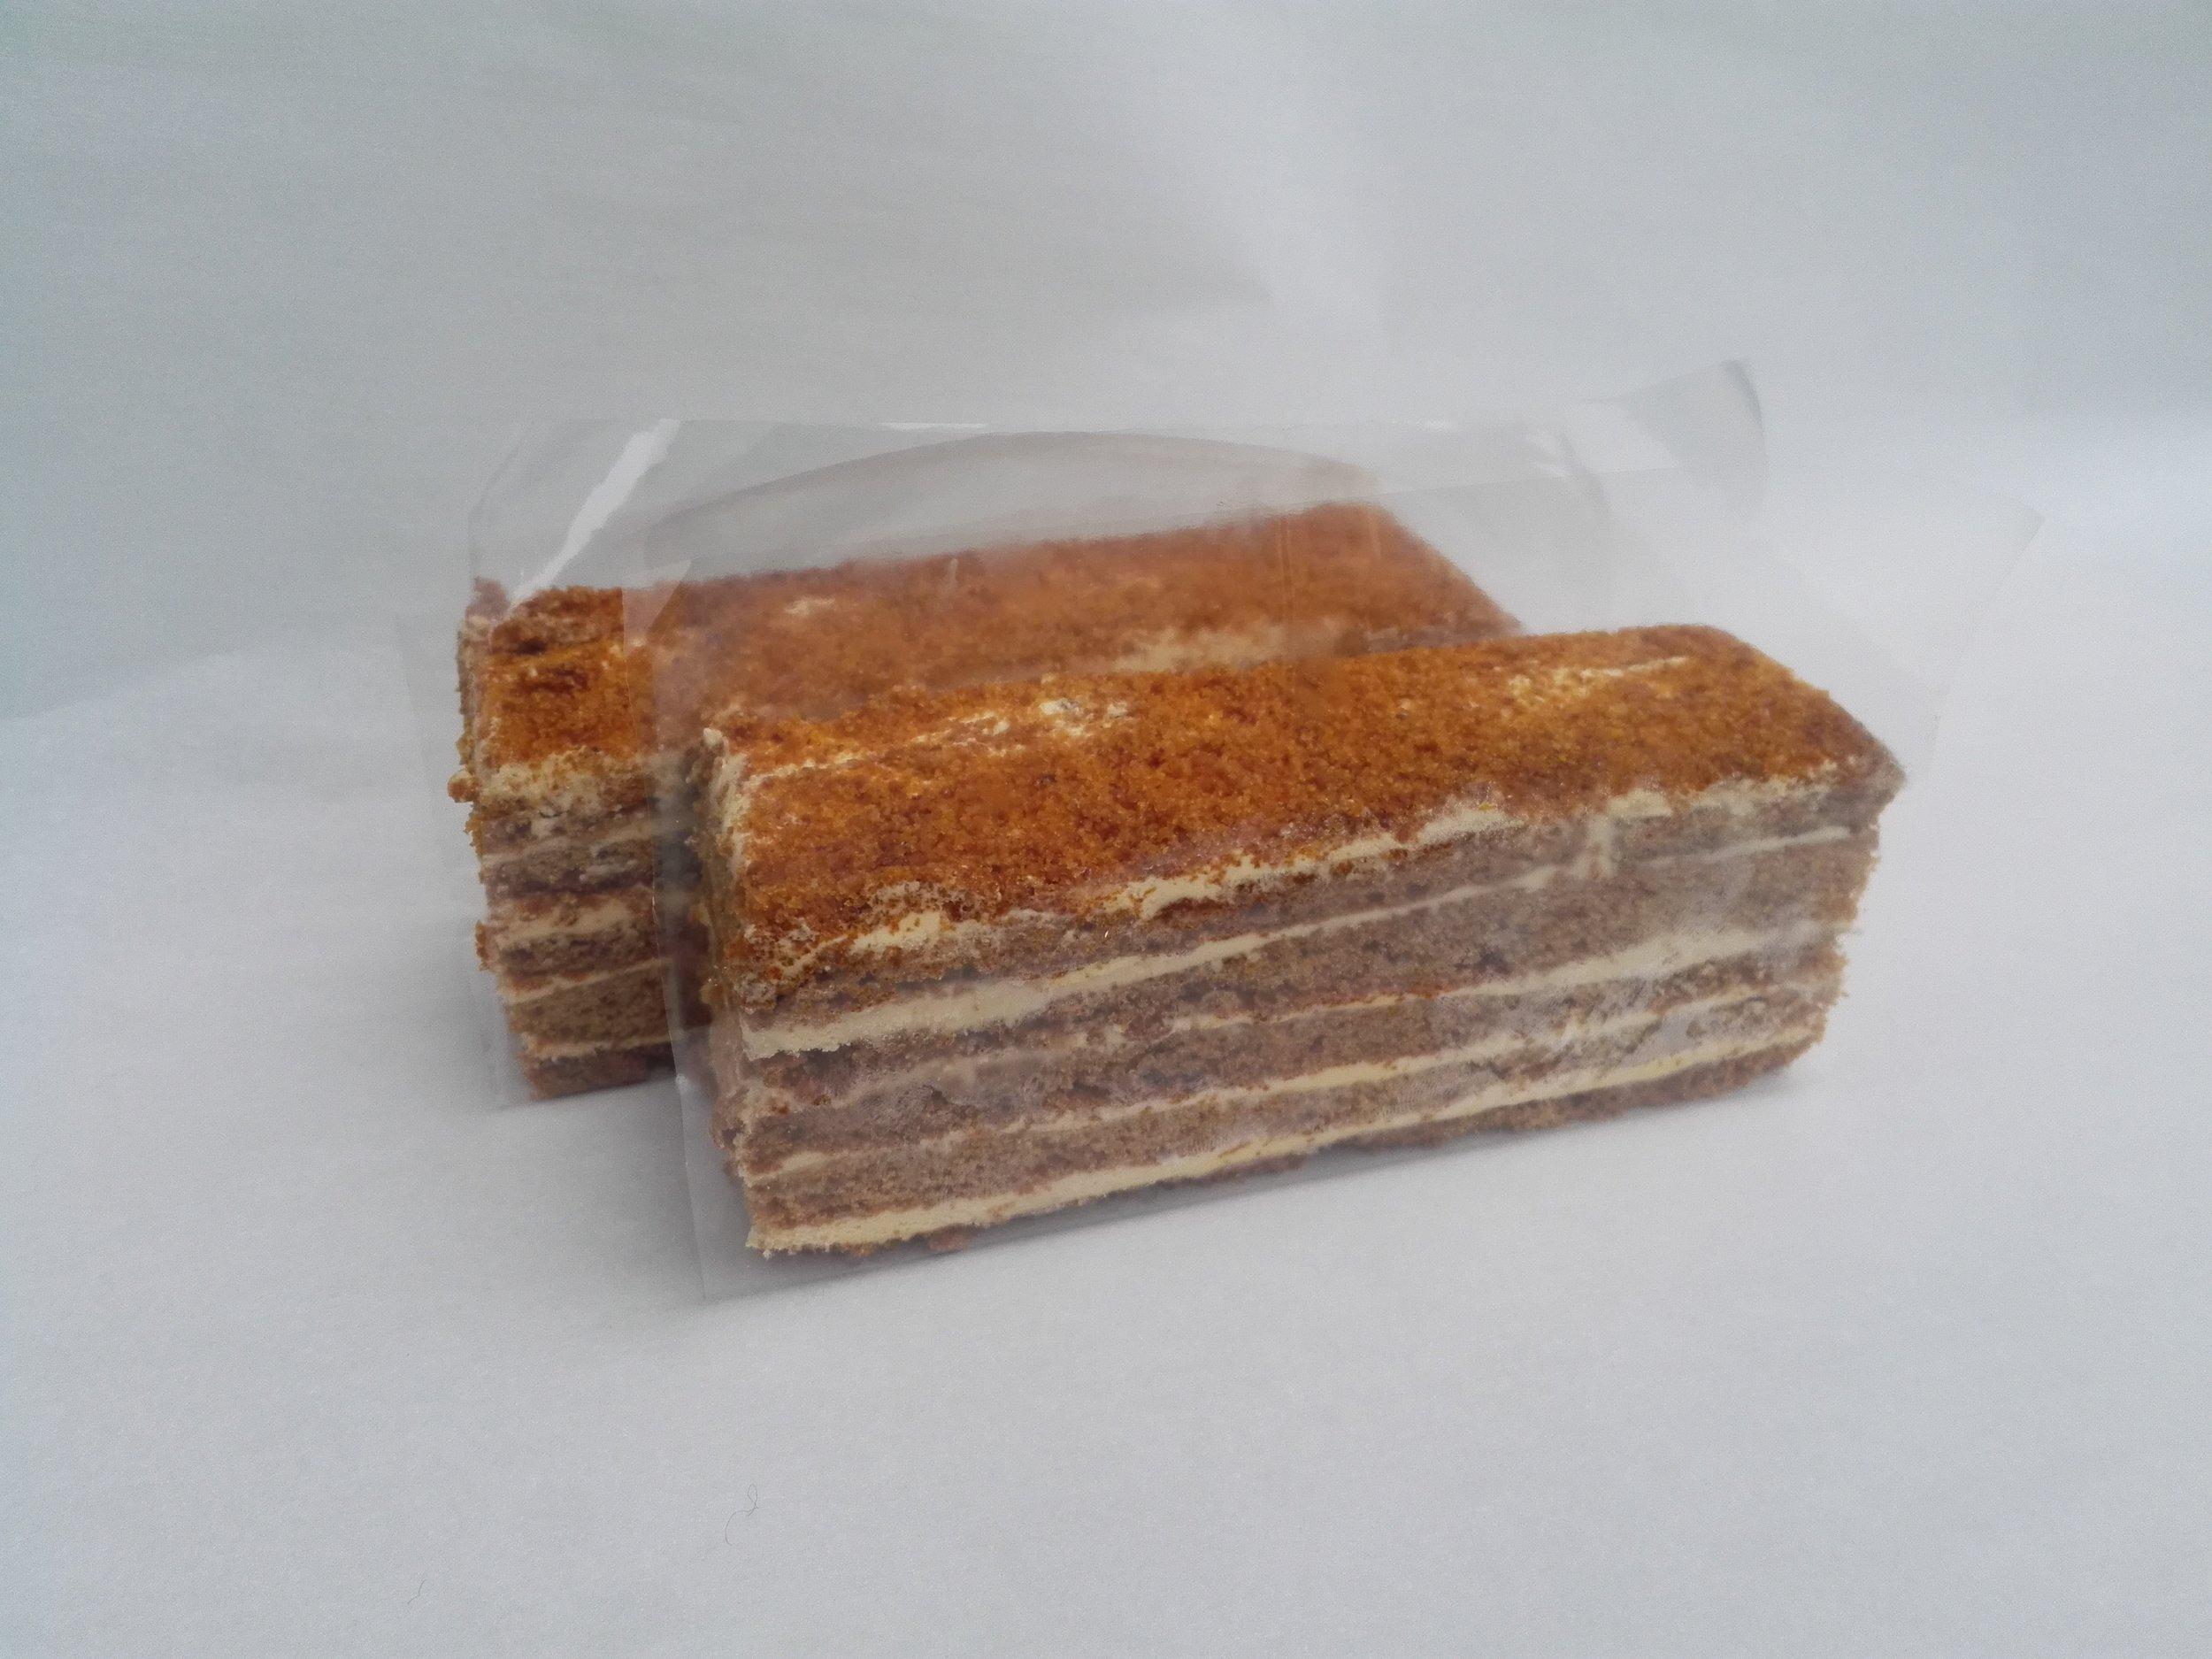 Russian_Honey_Cake_from_Russian_Pies.jpg